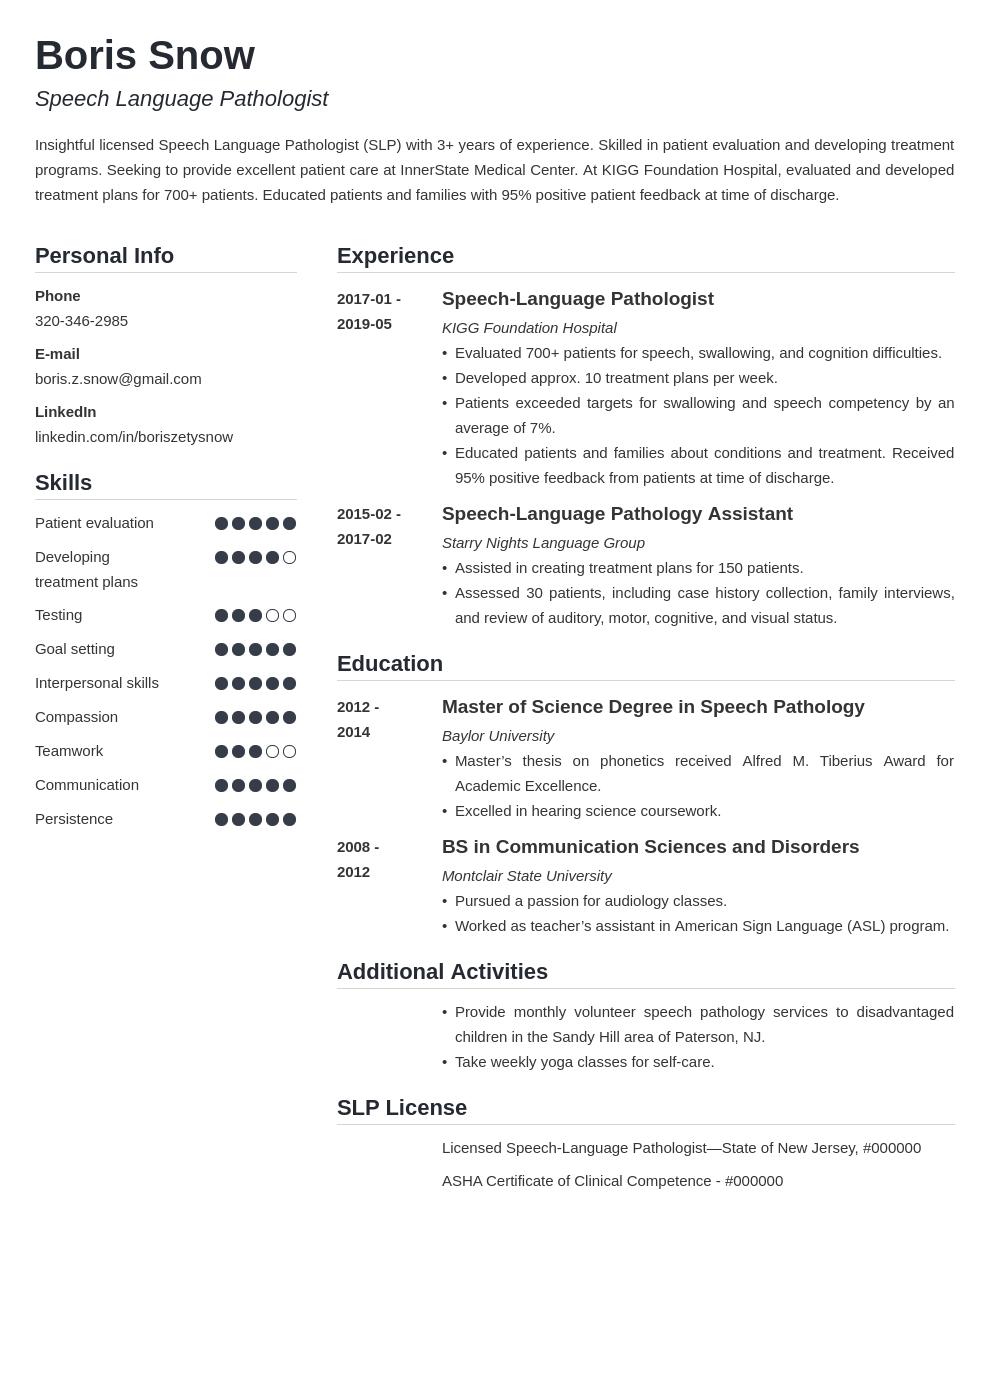 Speech Pathologist Resume Example Template Simple In 2020 Resume Examples Job Resume Examples Resume